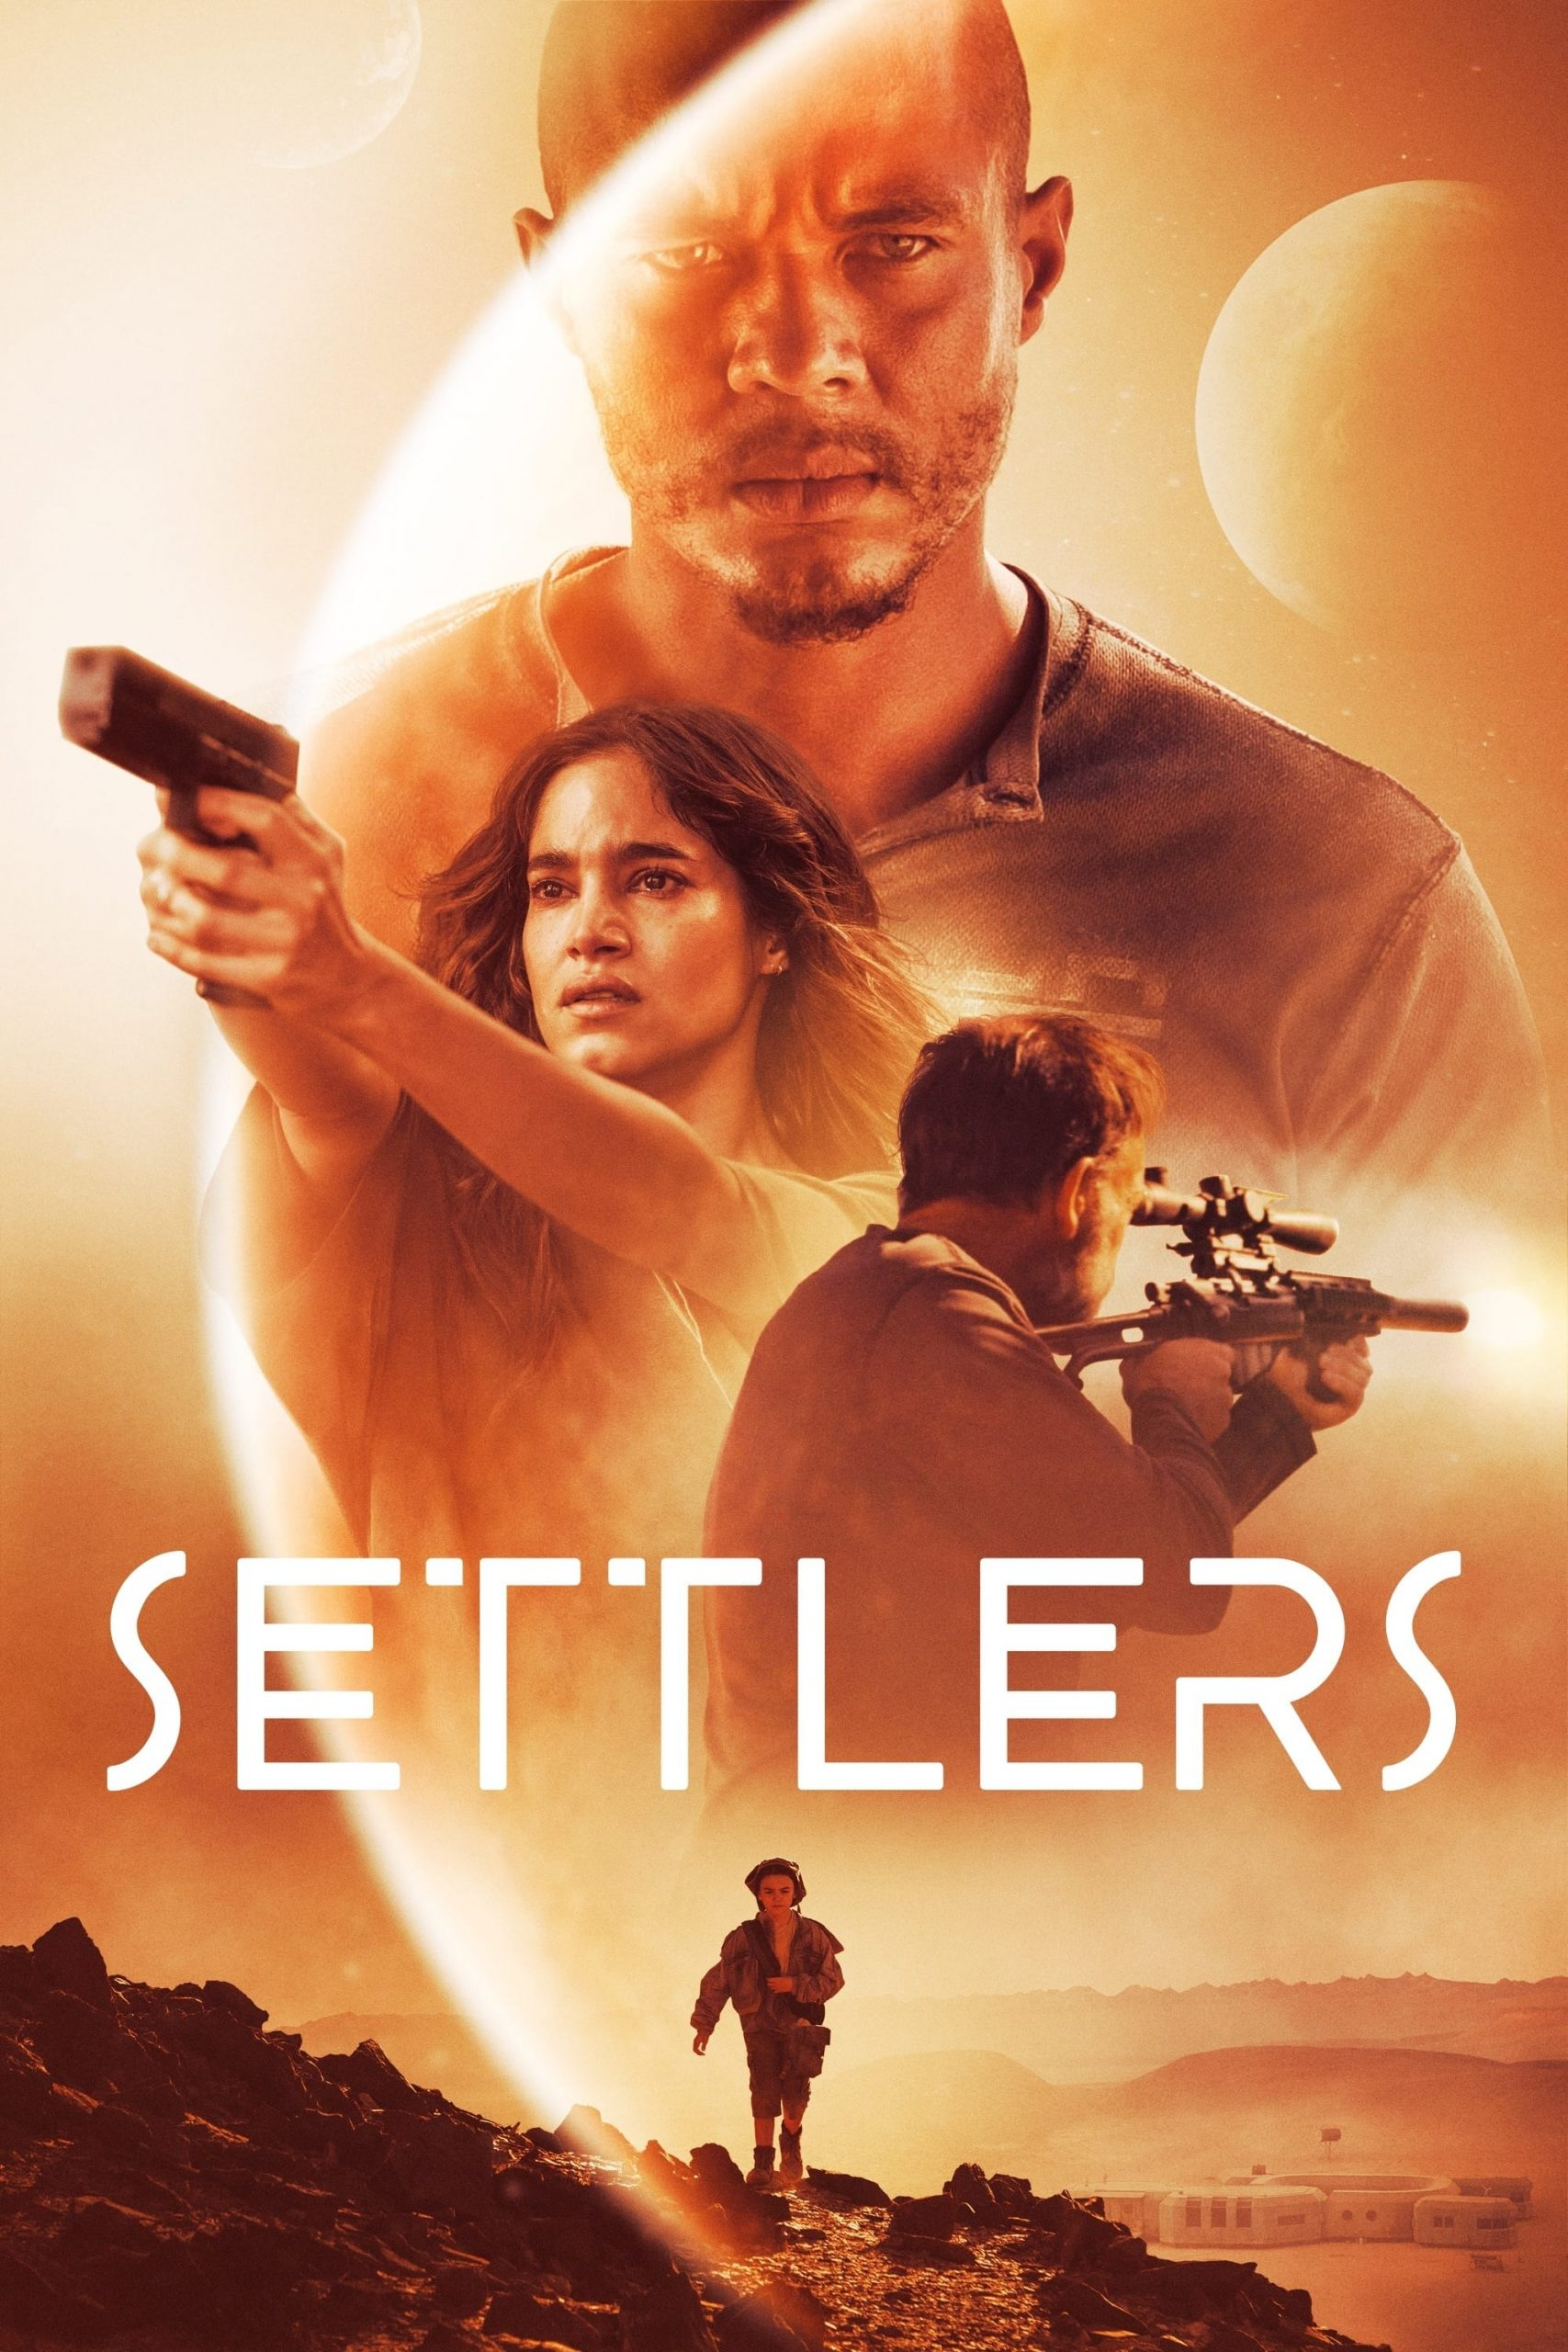 Poster for Settlers